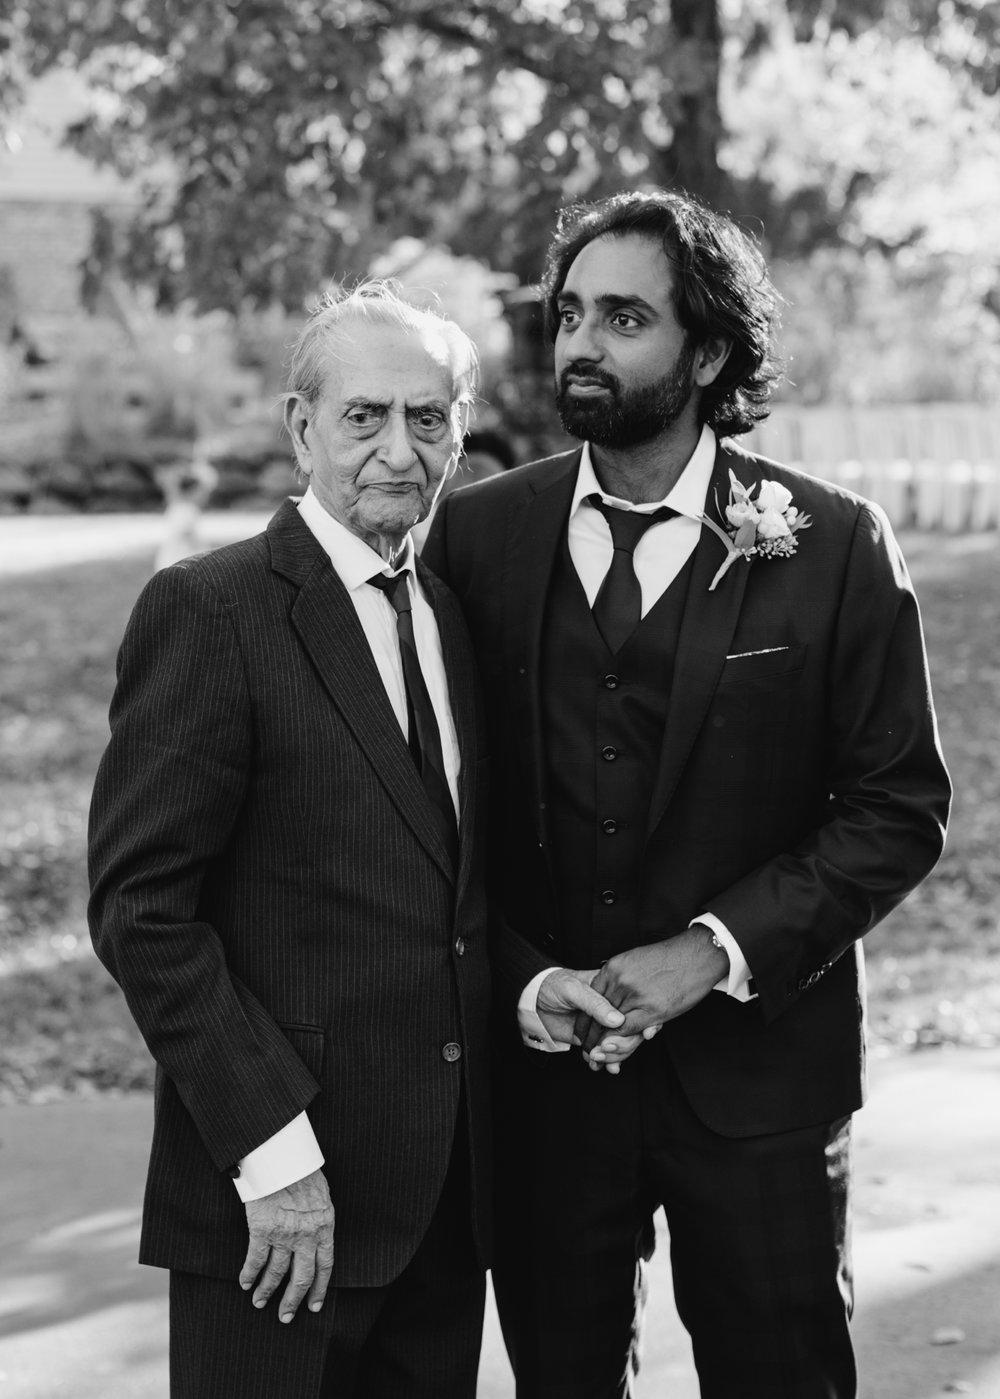 milwaukee-documentary-wedding-photography_0043.jpg